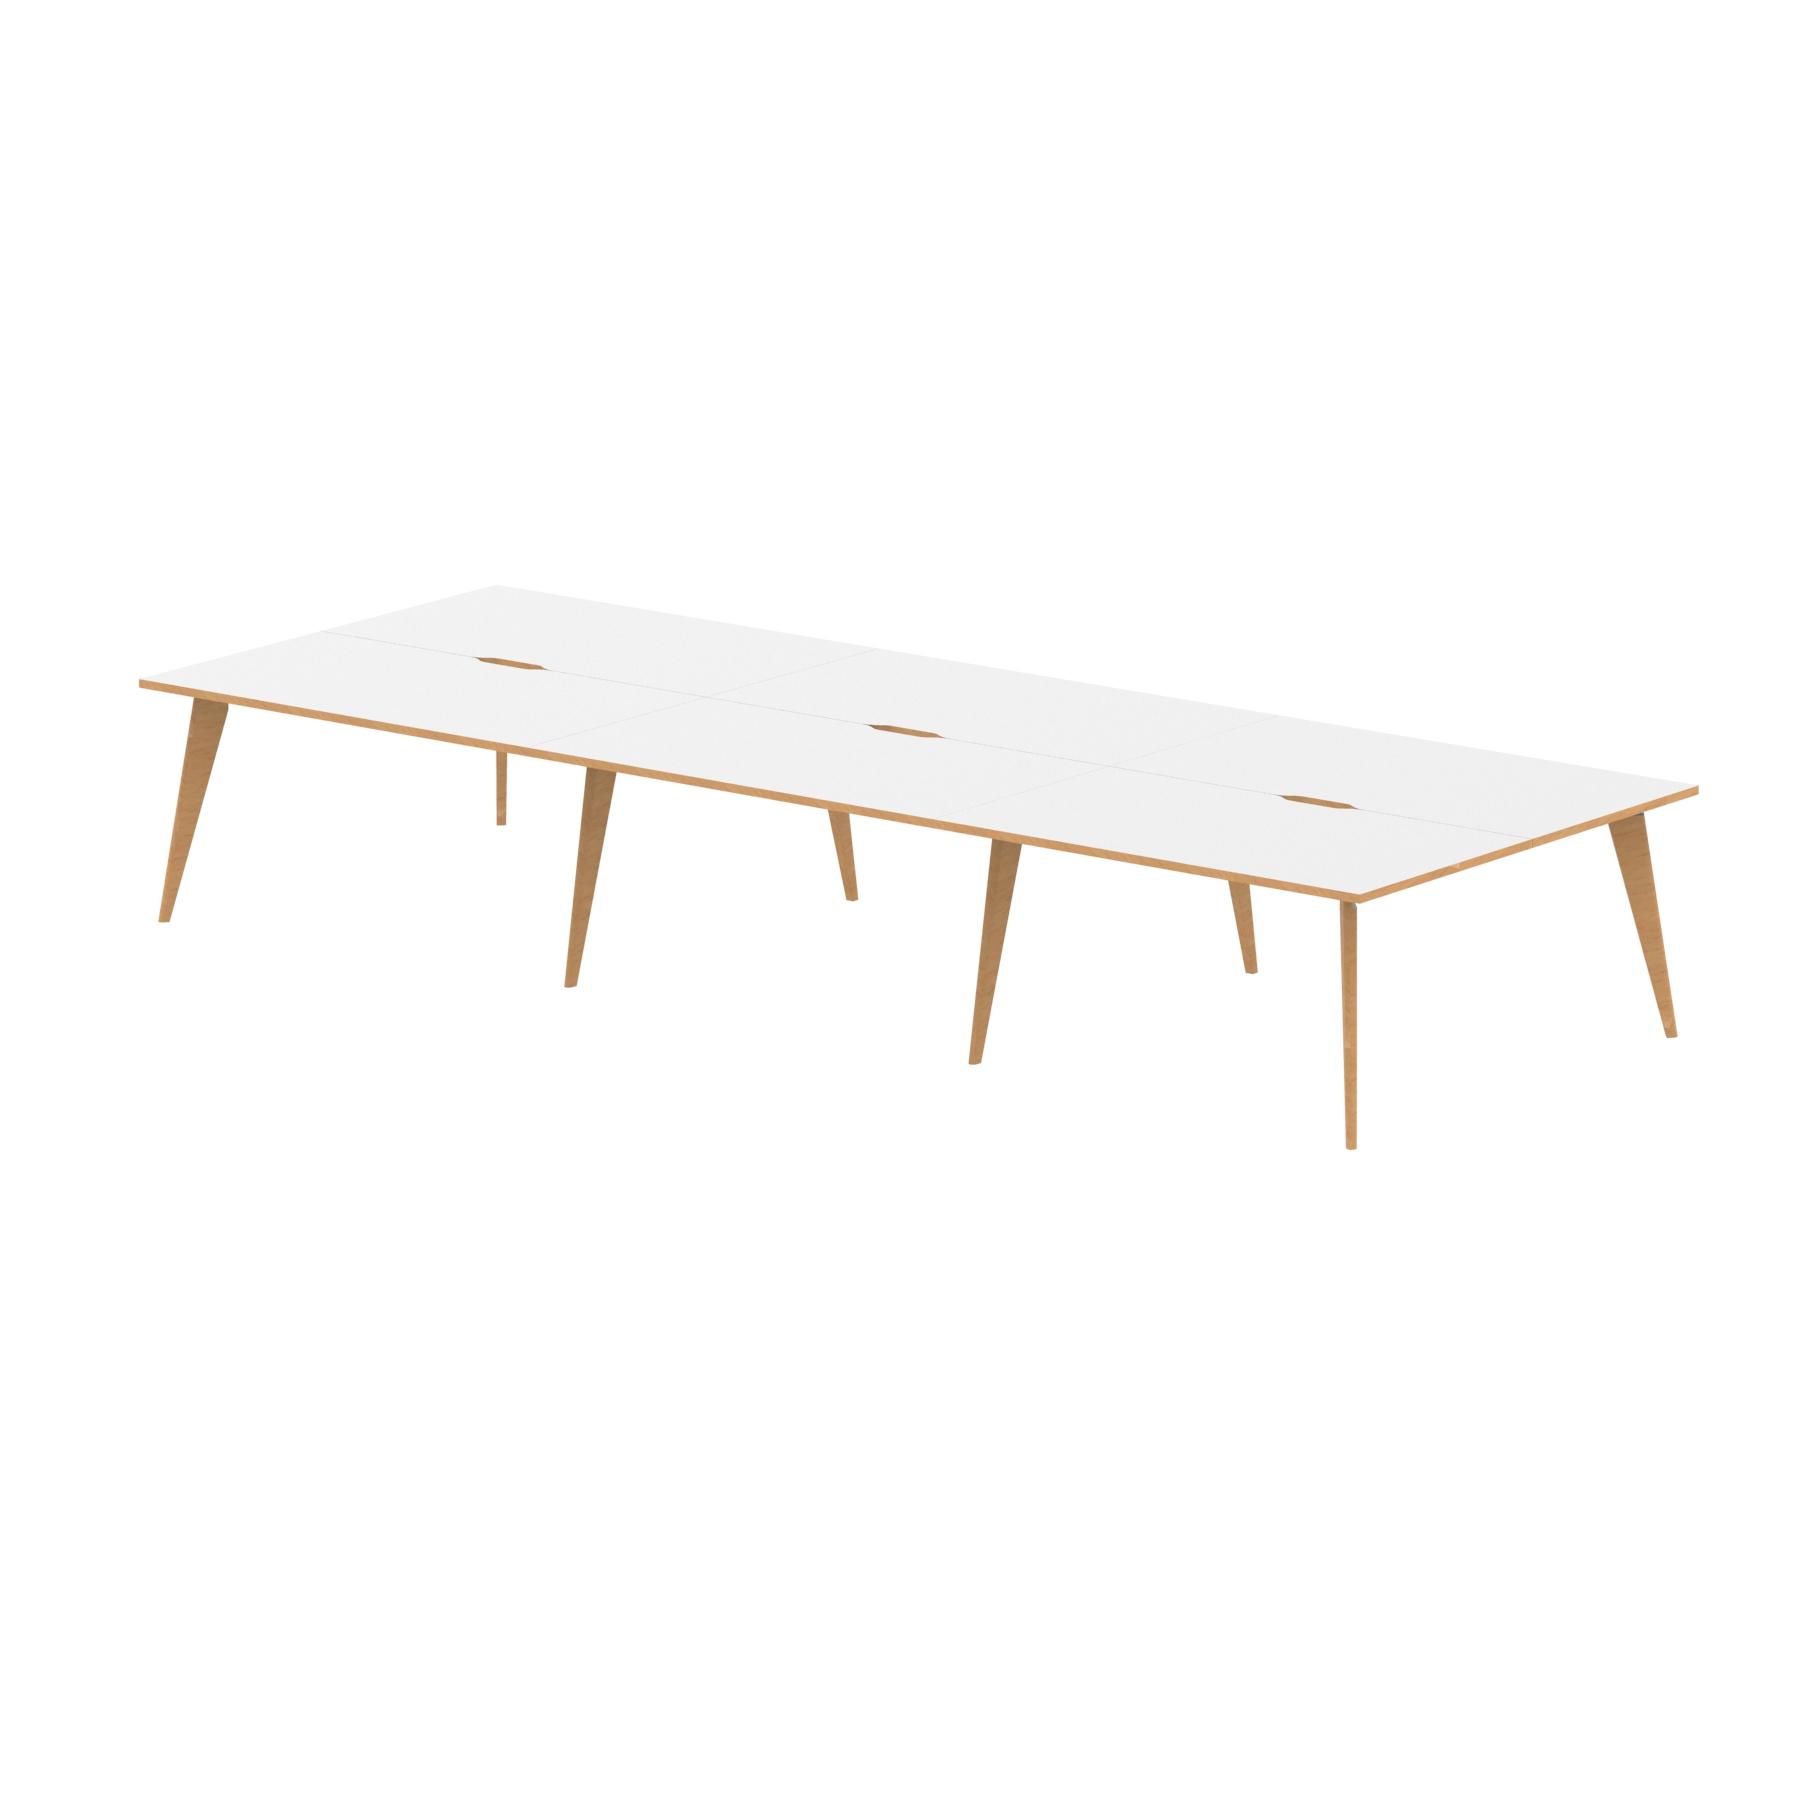 Oslo B2B White Frame Wooden Leg Bench Desk 1400 White With Natural Wood Edge (6 Pod)